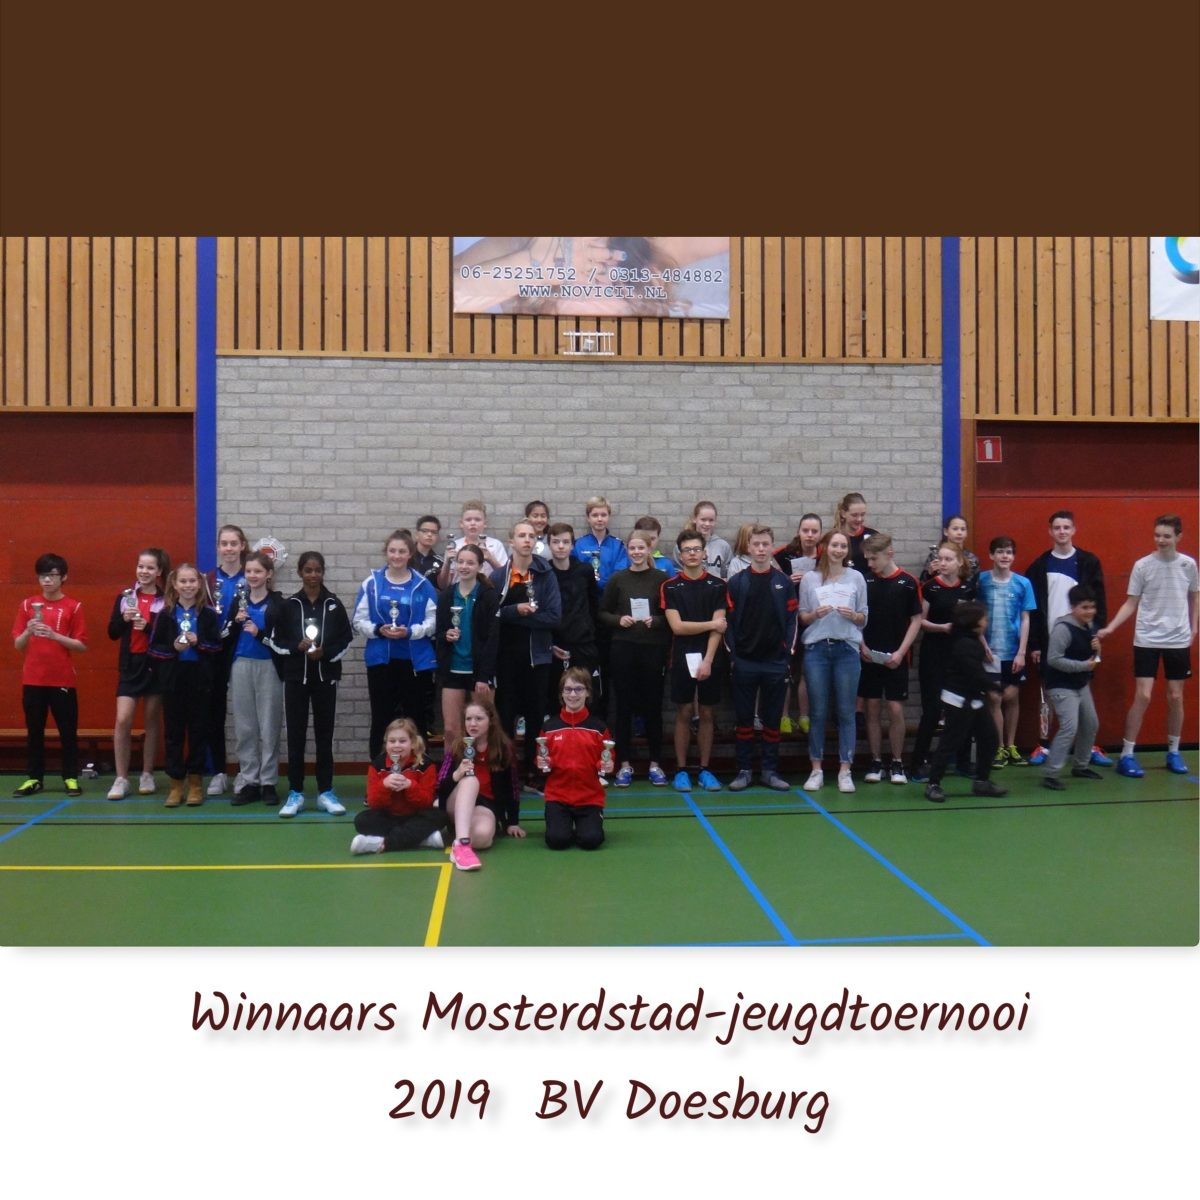 Mosterdstad Jeugdtoernooi 2019 Badminton Vereniging Doesburg